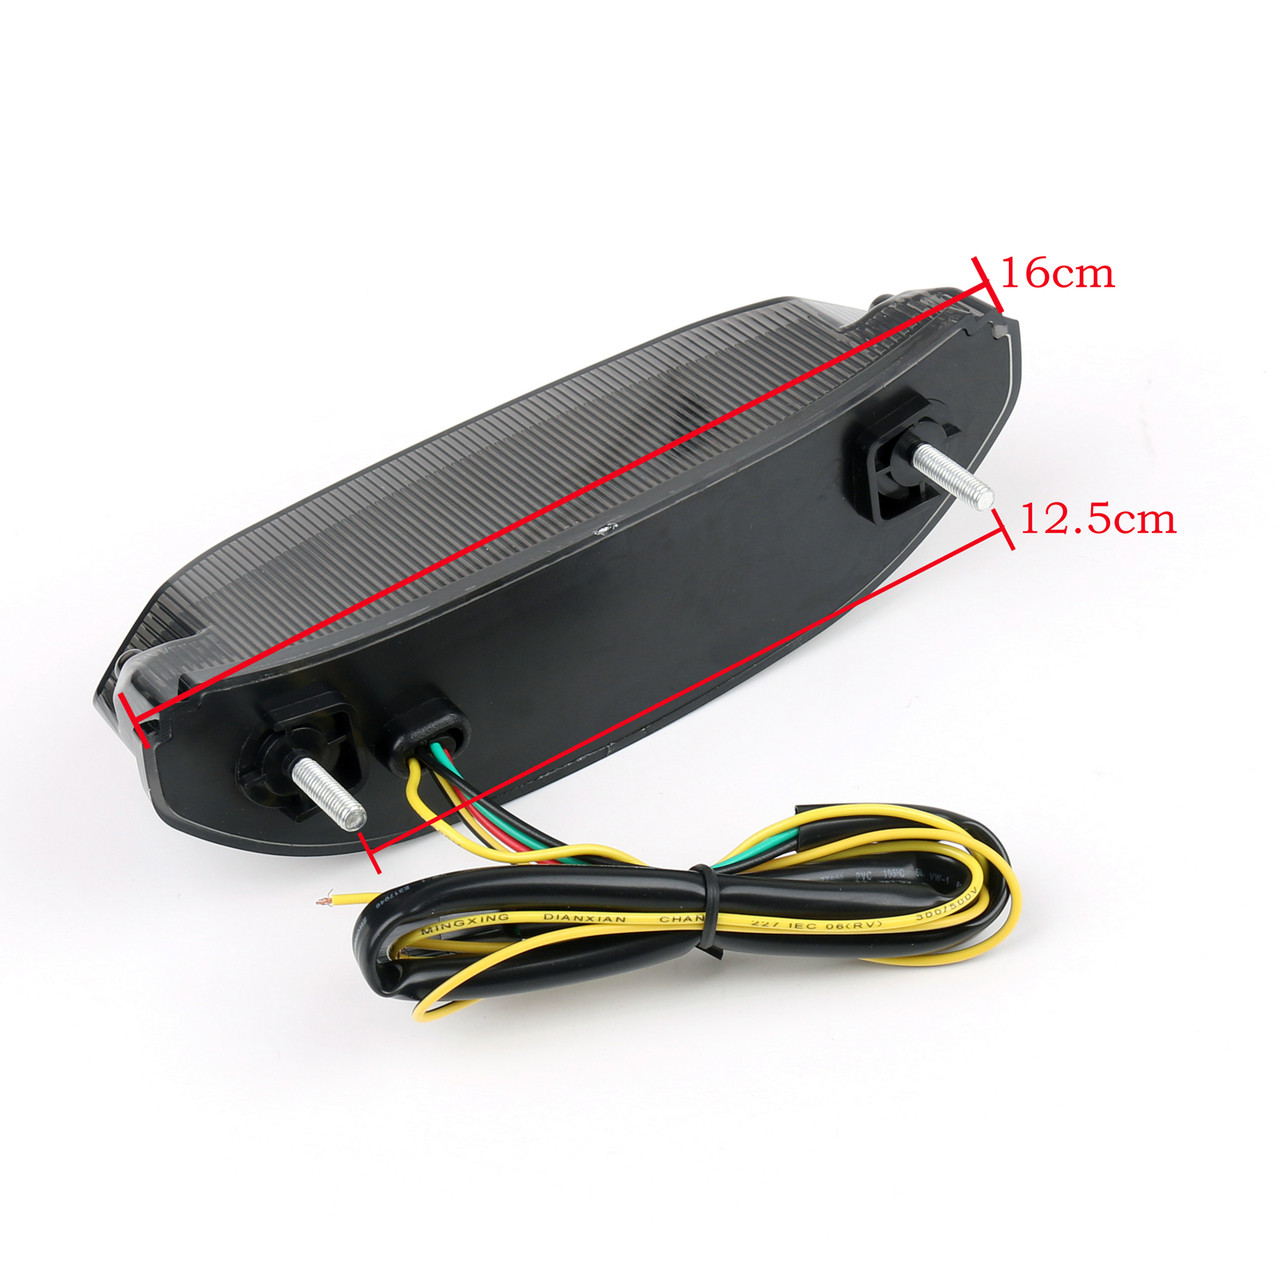 Tail Light LED Integrated Turn signals Honda CBR600RR (2013-2014), Smoke